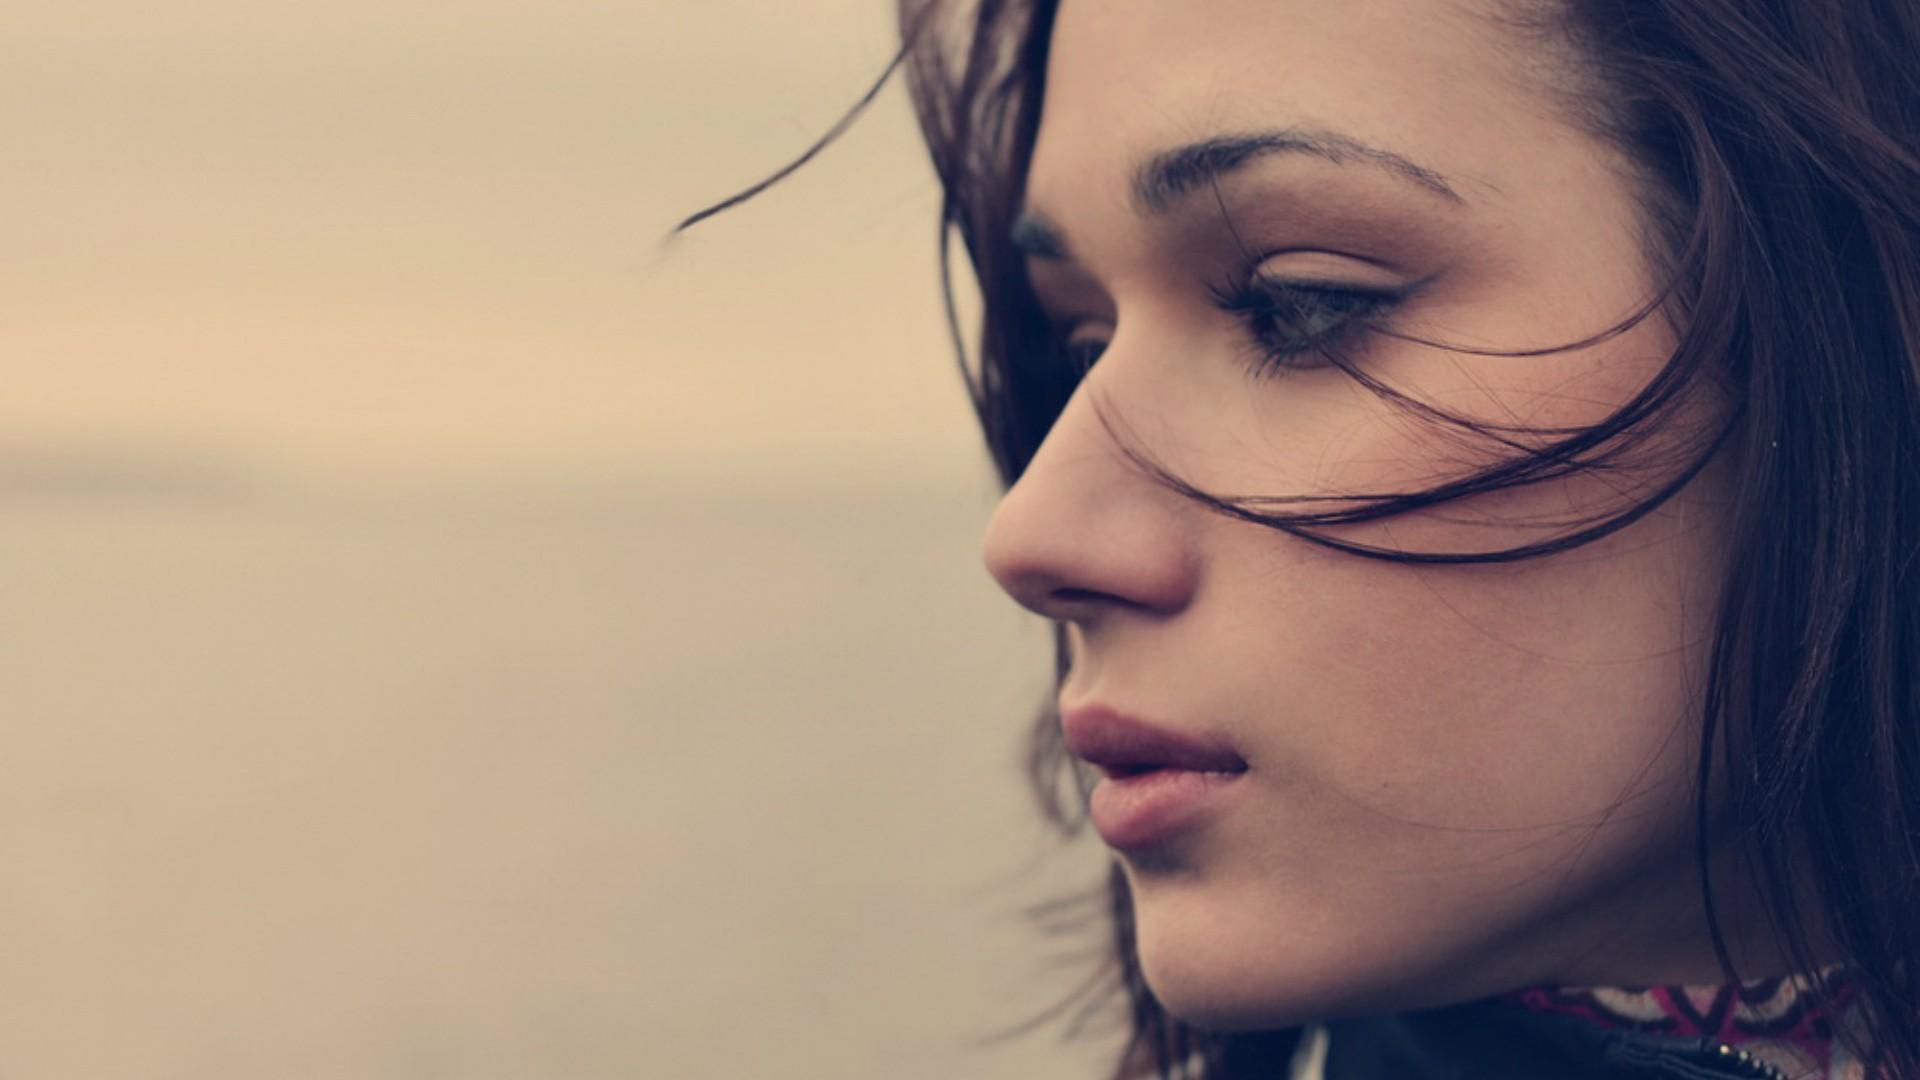 Cute Girl Faces Profile